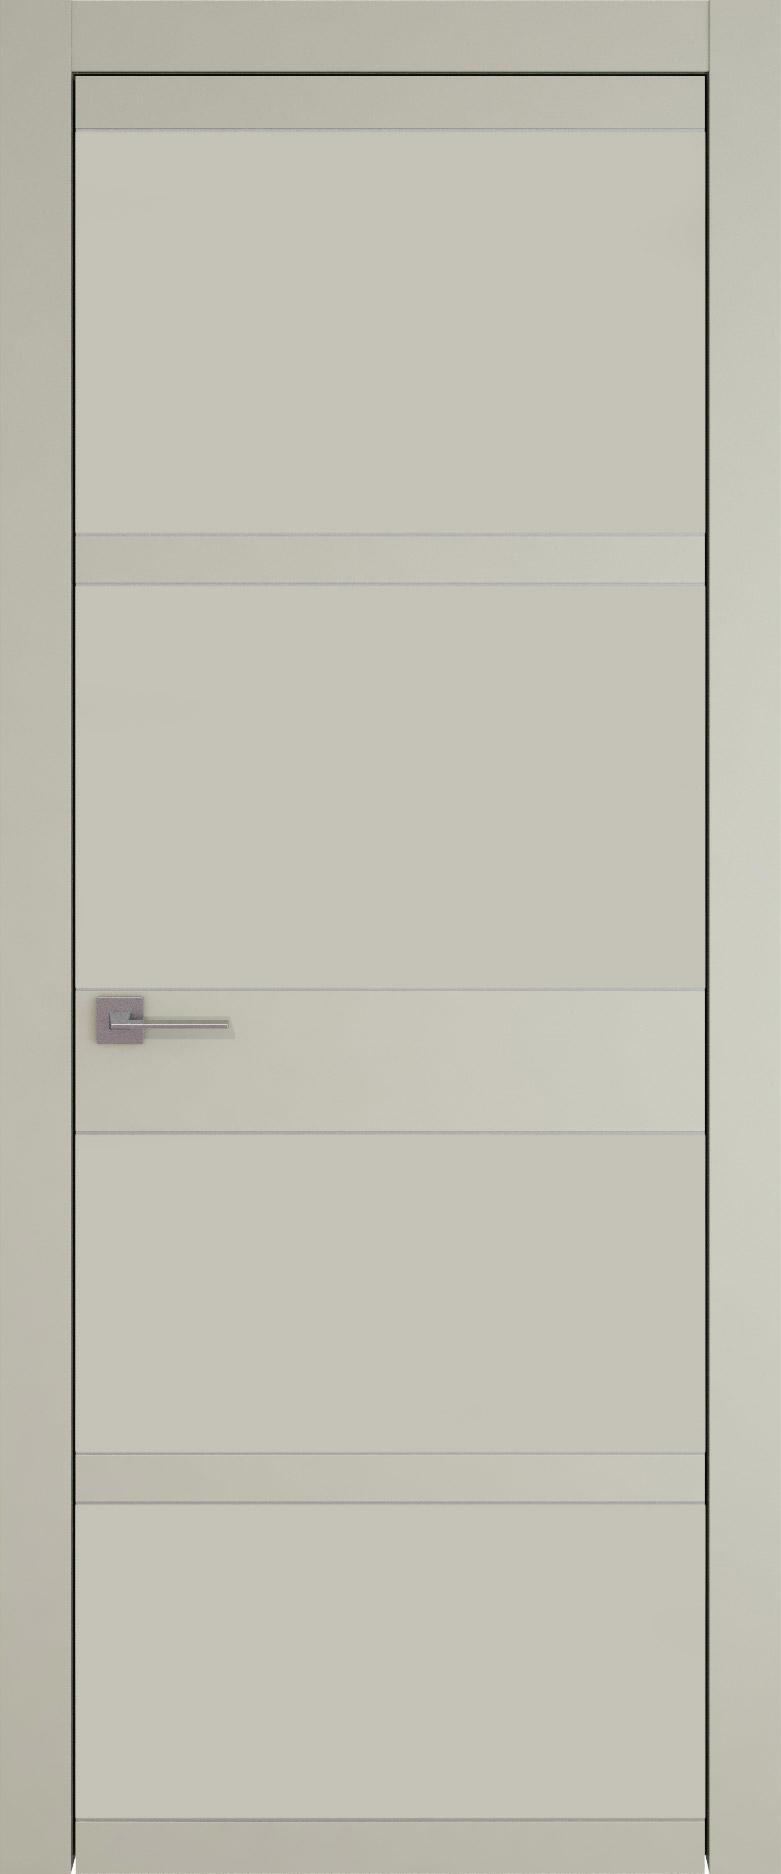 Tivoli Е-2 цвет - Серо-оливковая эмаль (RAL 7032) Без стекла (ДГ)